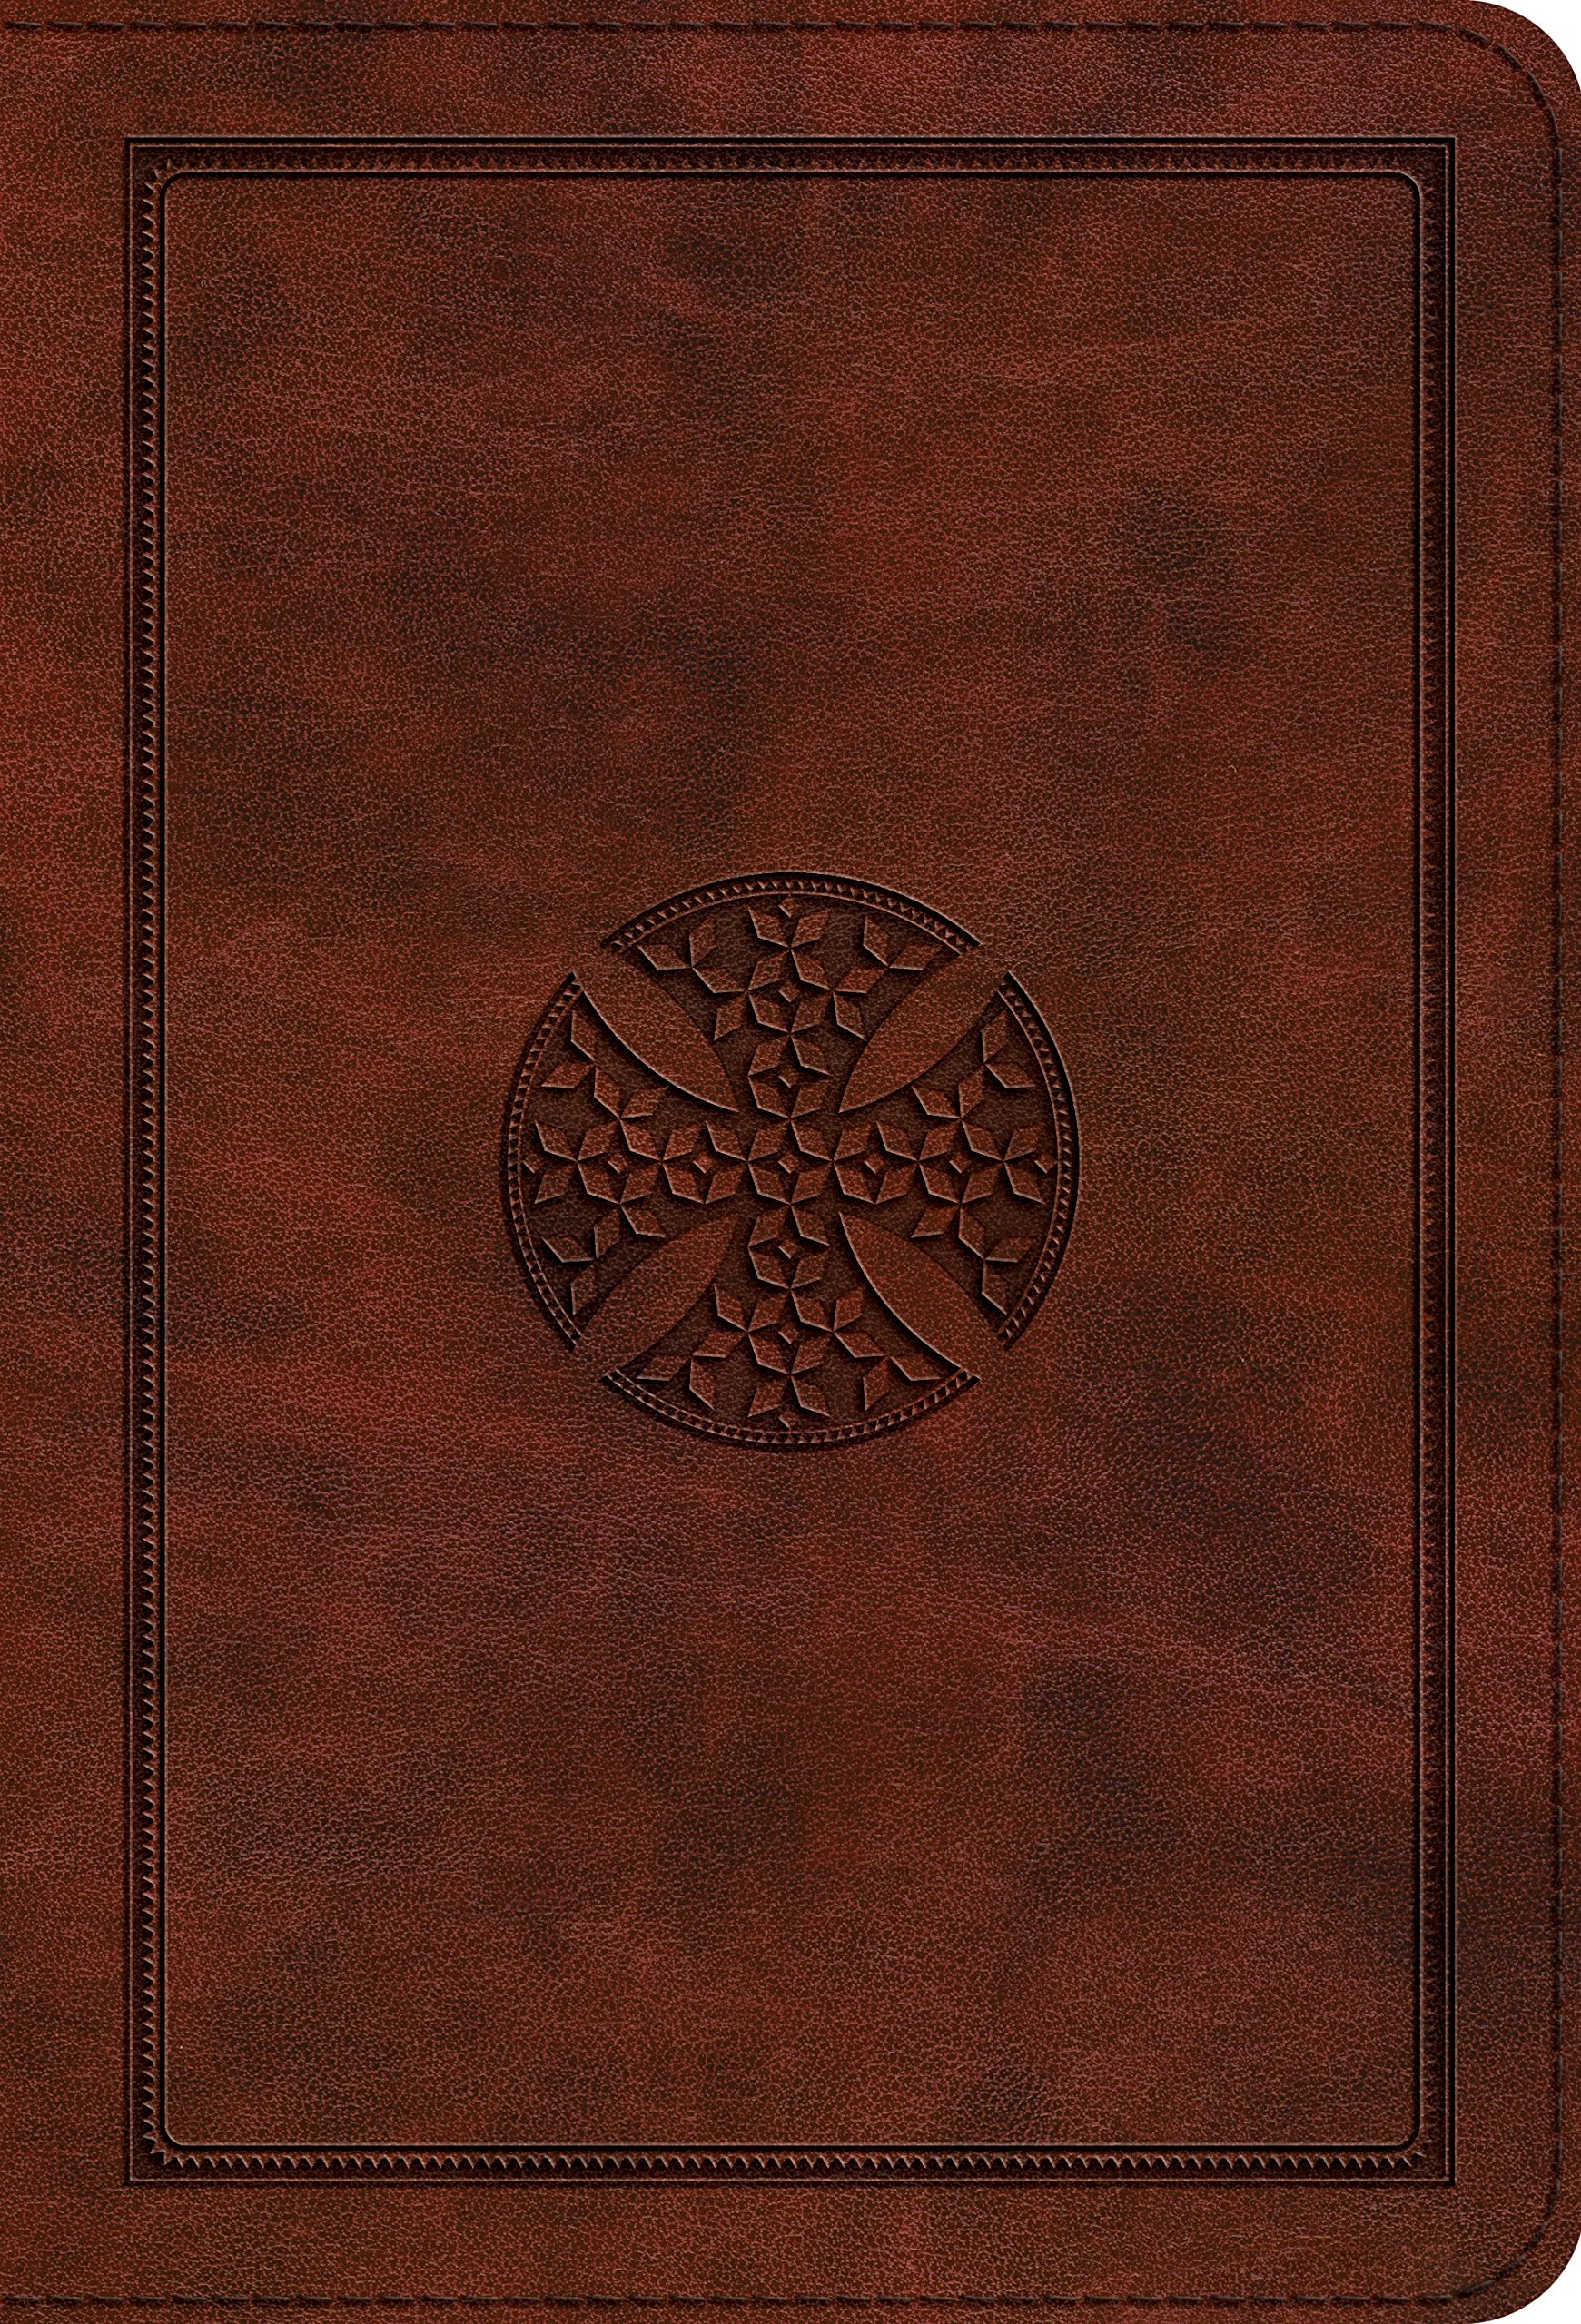 ESV Large Print Compact Bible (TruTone, Brown, Mosaic Cross Design) PDF